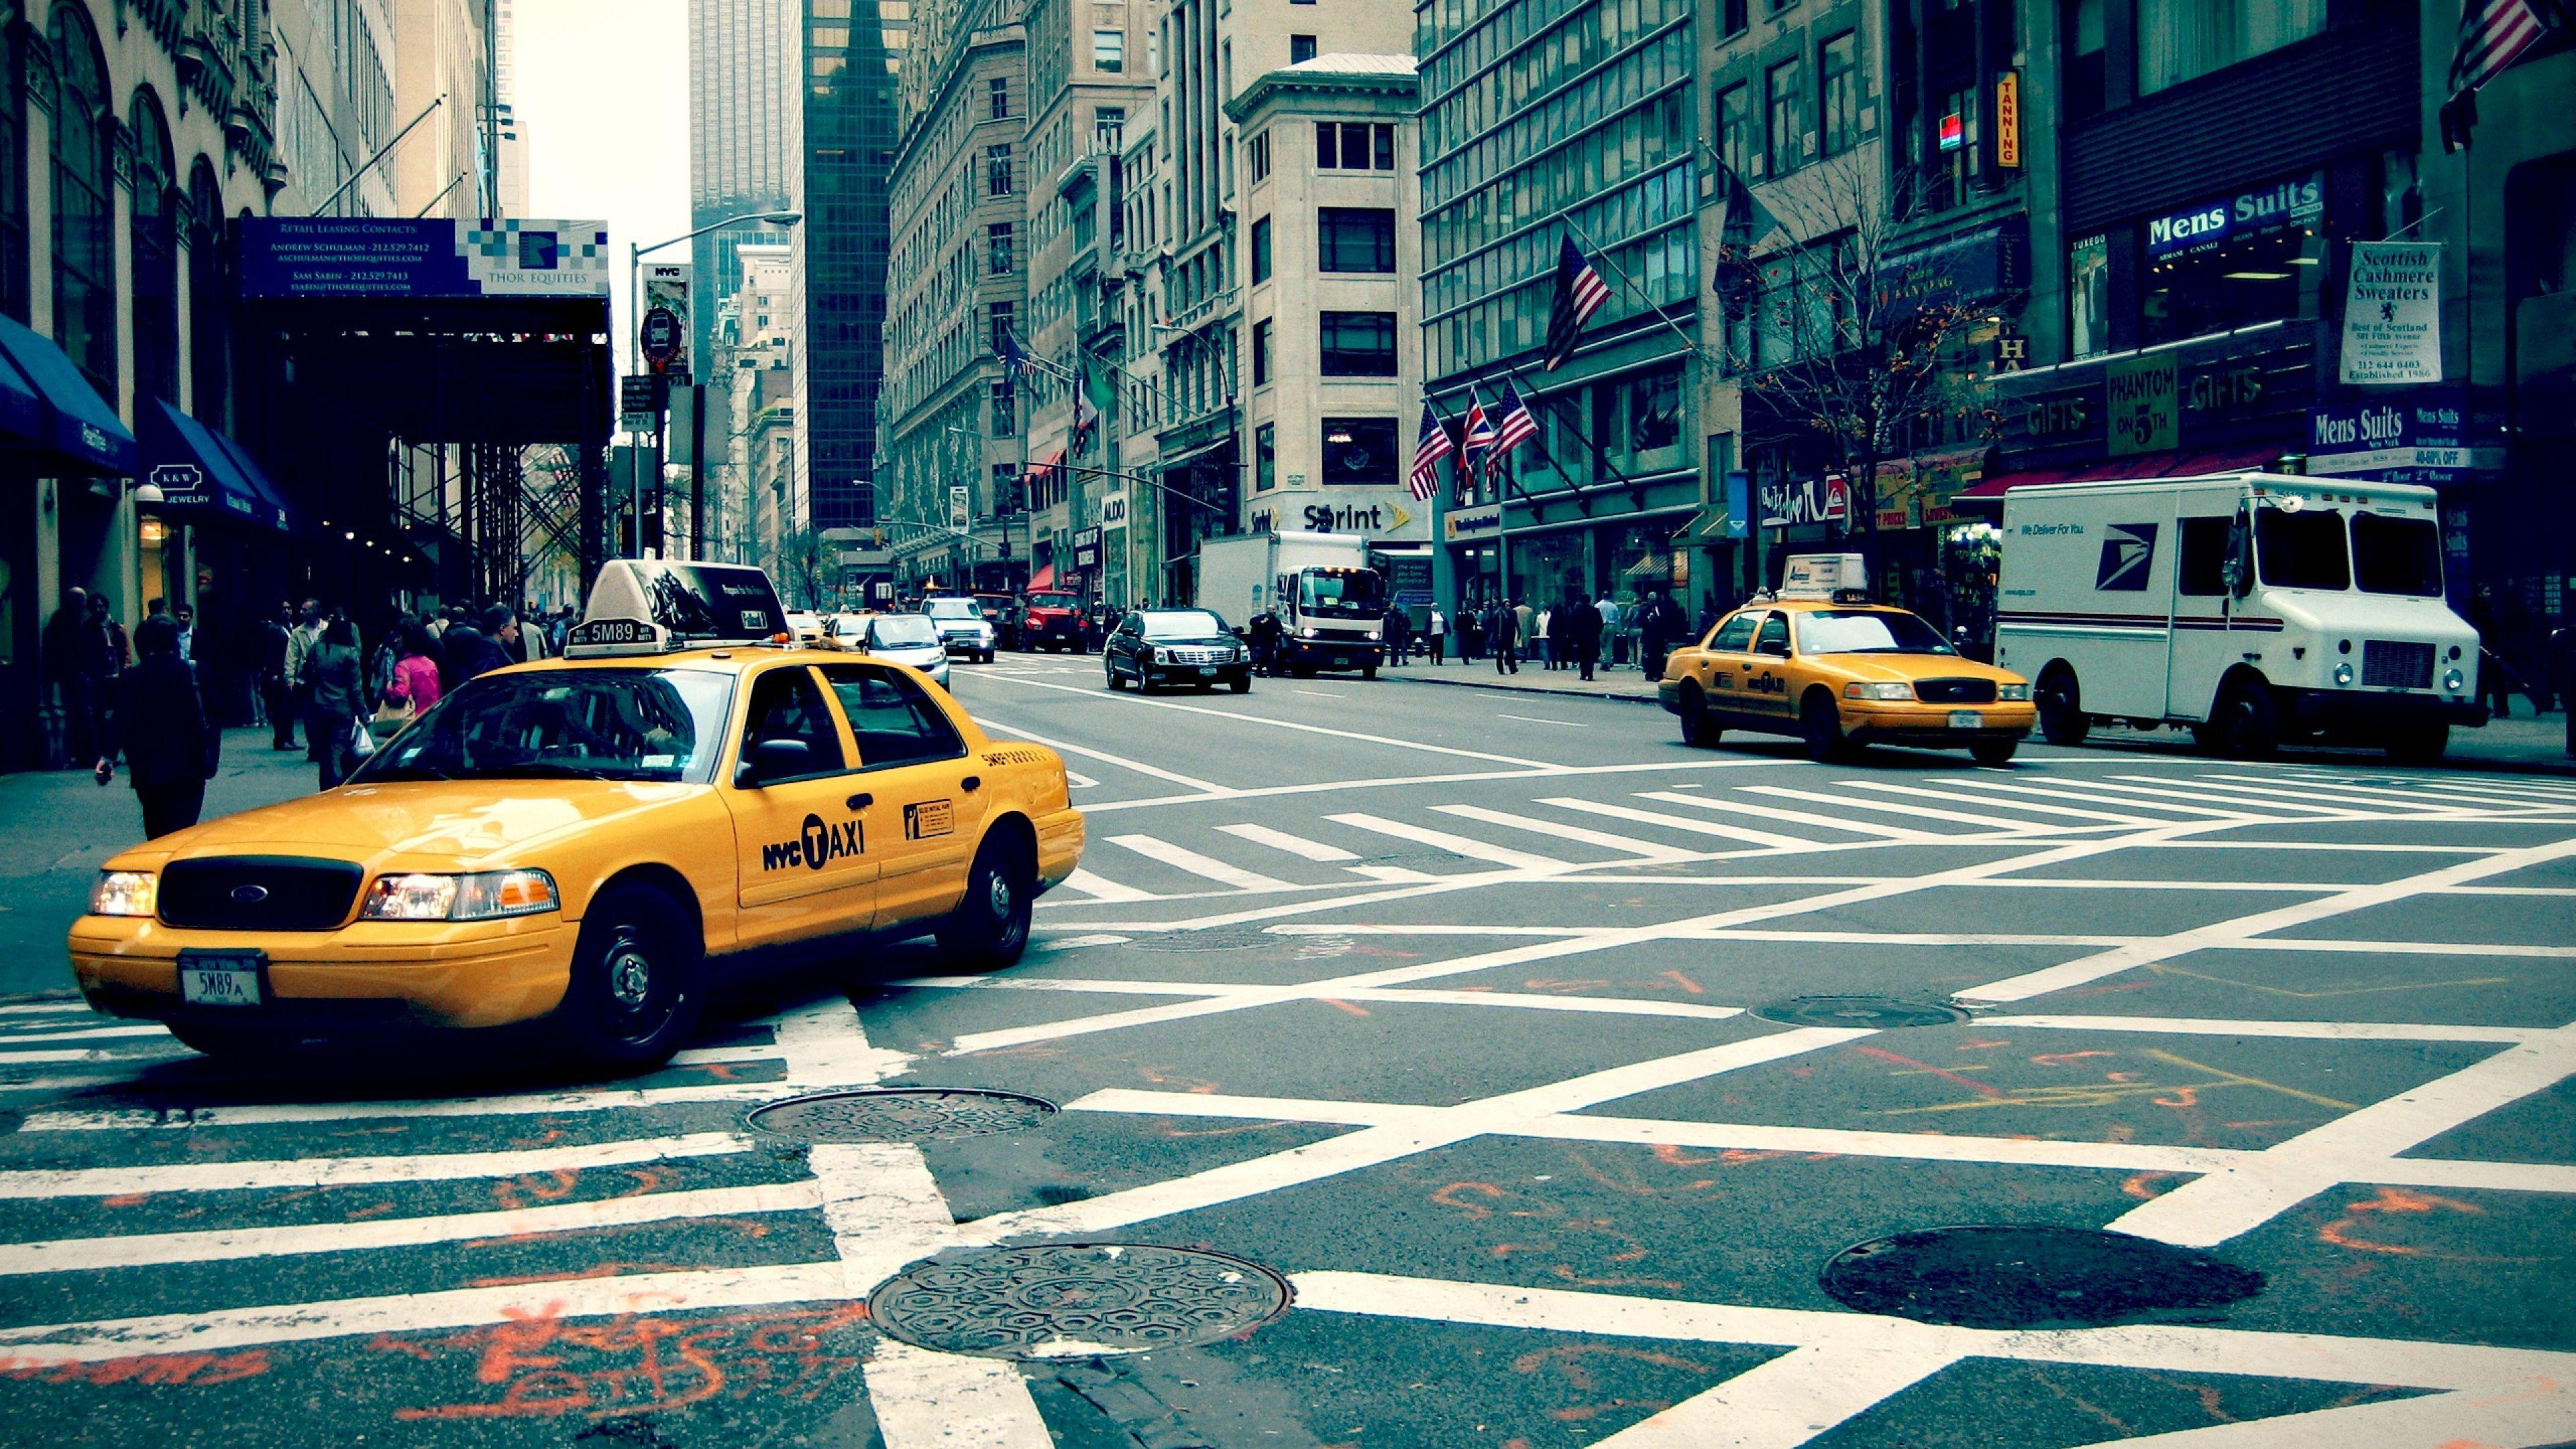 Download Wallpaper 3840x2160 New York City Street Taxi 4k Ultra Street Pictures New York Taxi New York City Ny